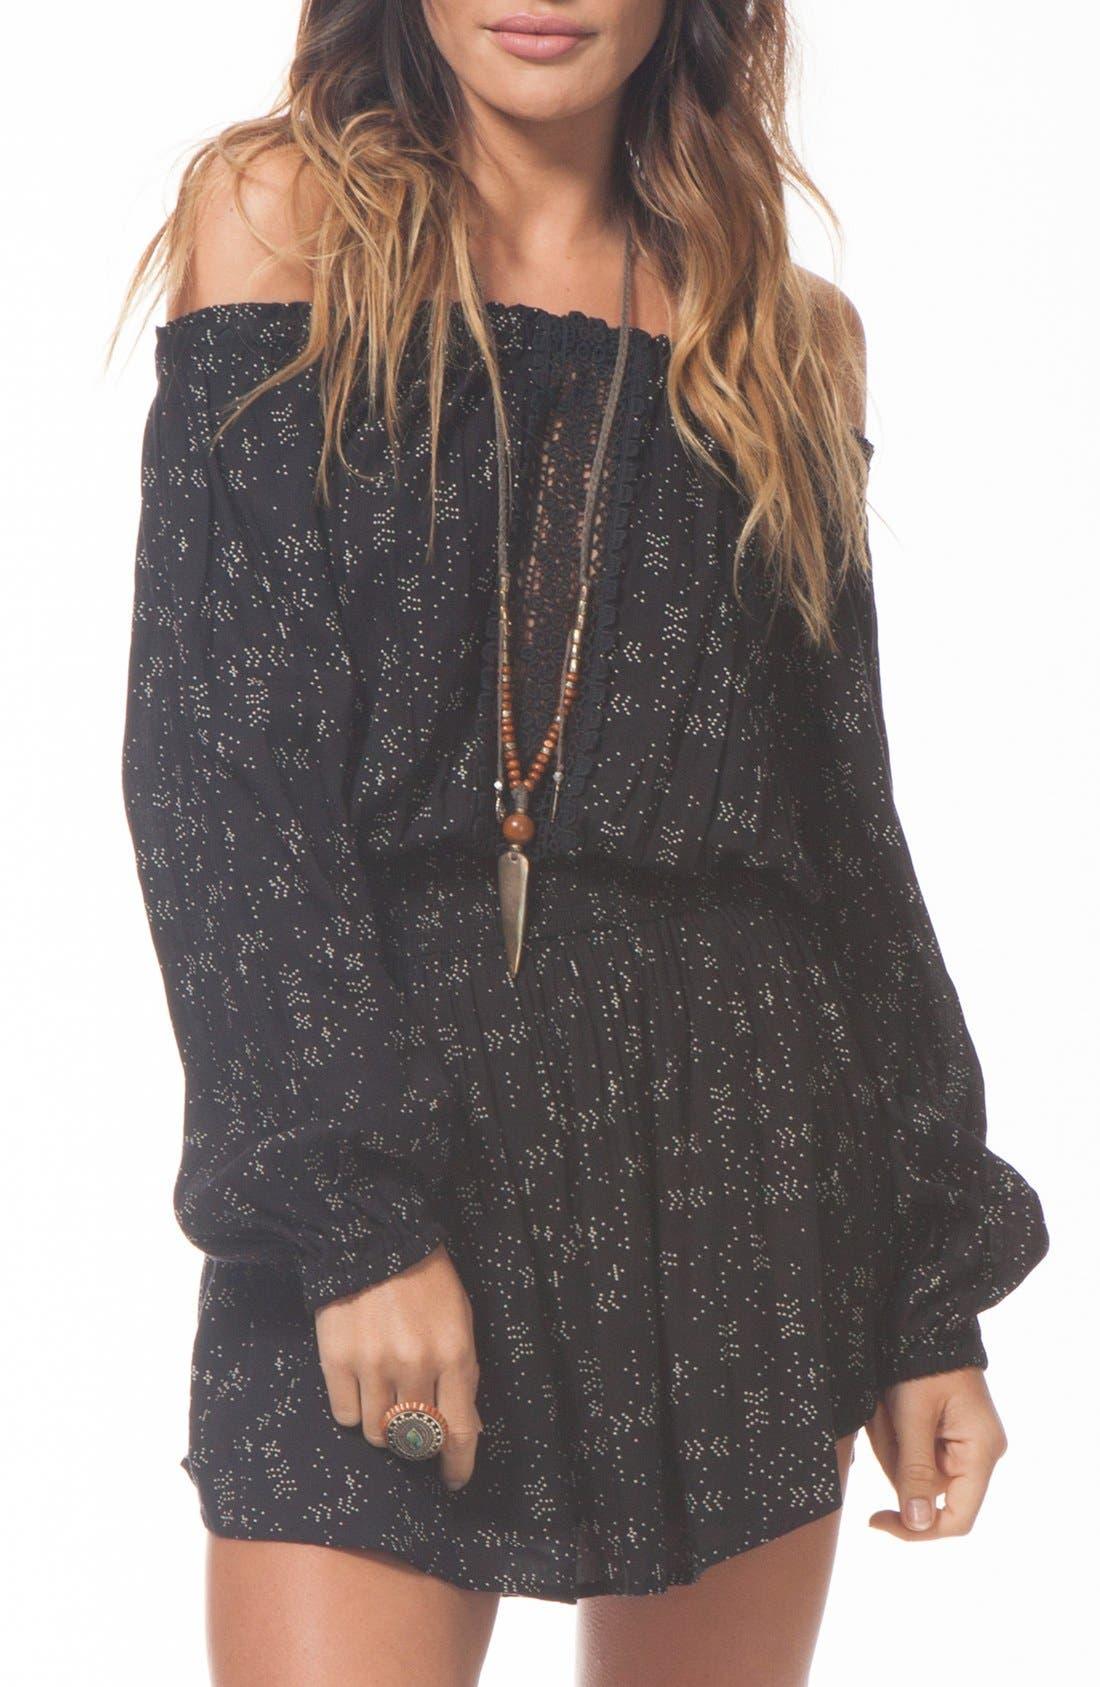 Main Image - Rip Curl 'Starlight' Print Off the Shoulder Dress